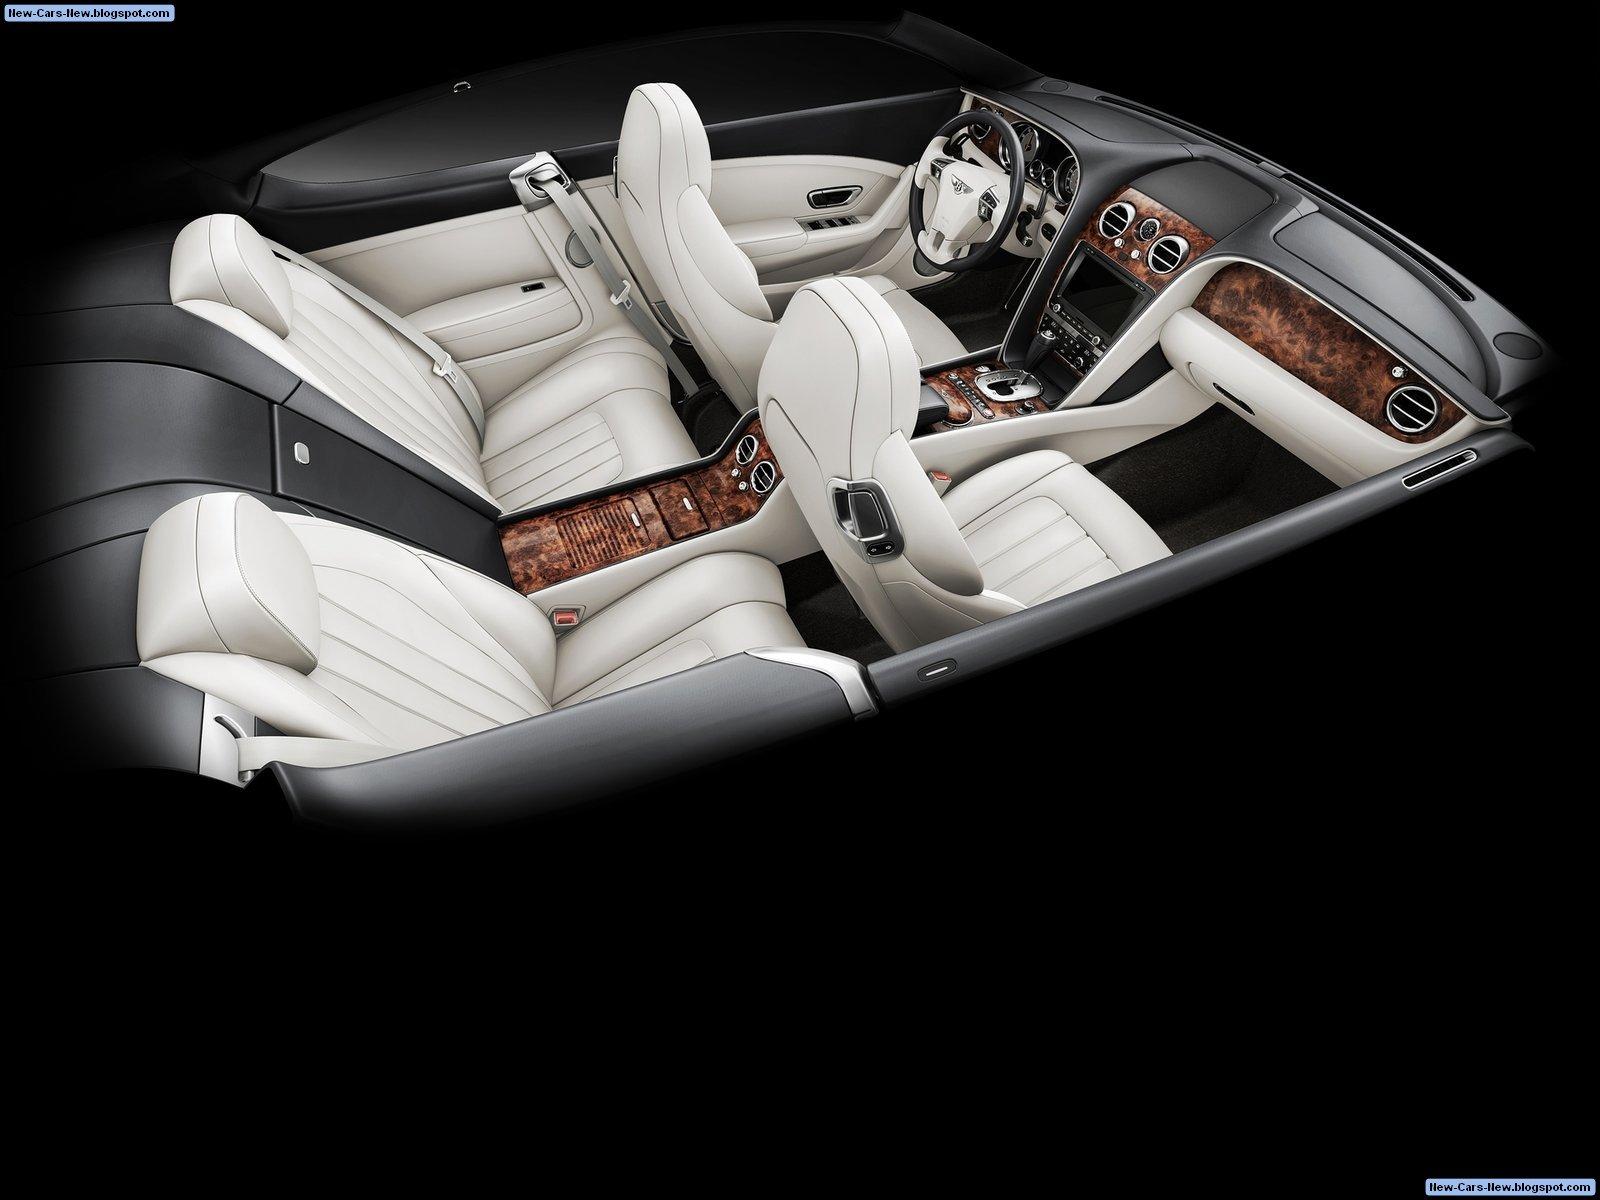 http://4.bp.blogspot.com/_U4w592tUDHM/TIfGUoXALEI/AAAAAAAAFdU/fRPwWnBjzv8/s1600/Bentley-Continental_GT_2012_1600x1200_wallpaper_12.jpg